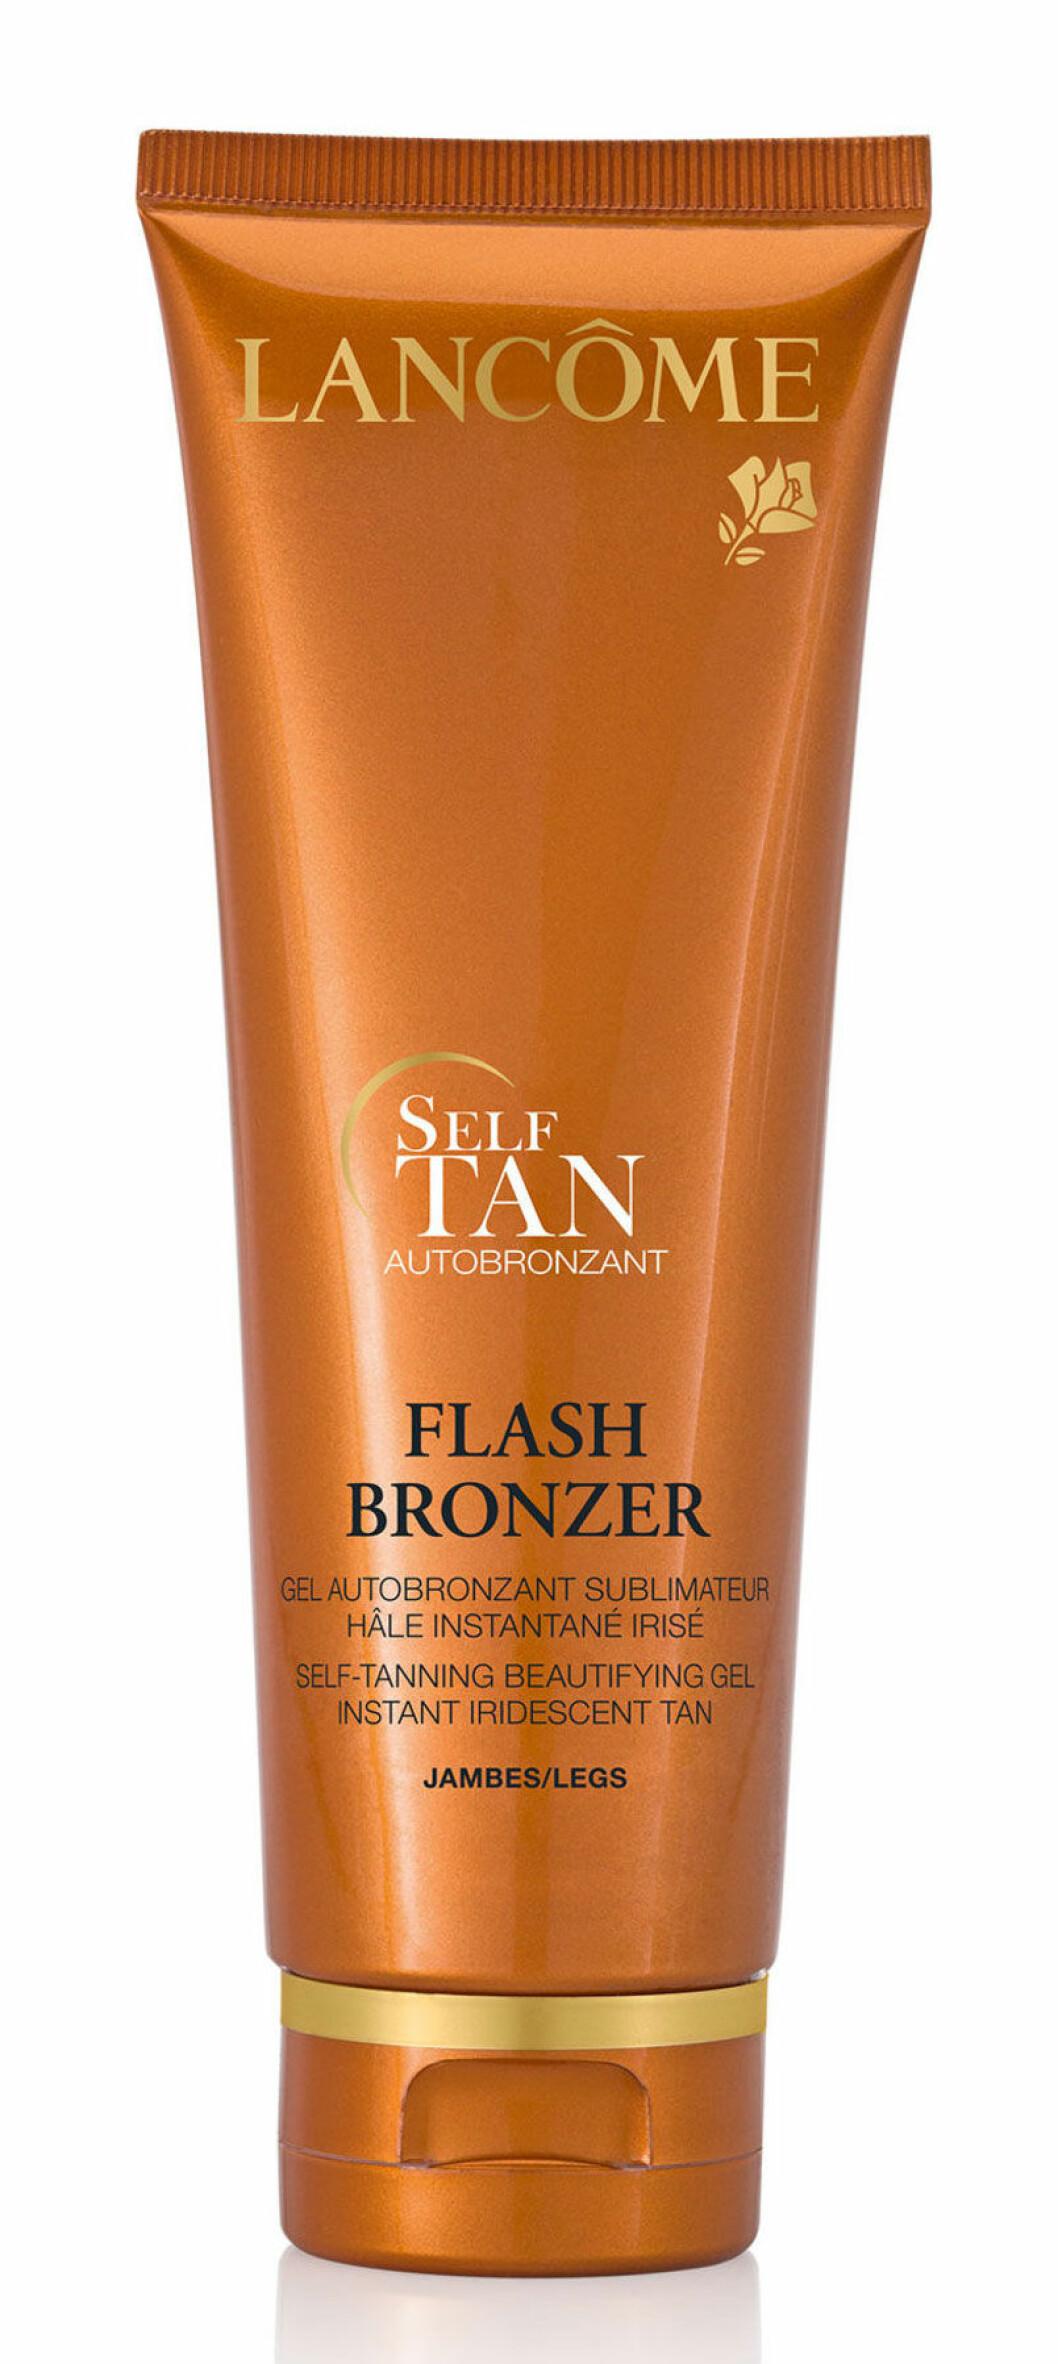 Lancome Flash Bronzer Gel Legs